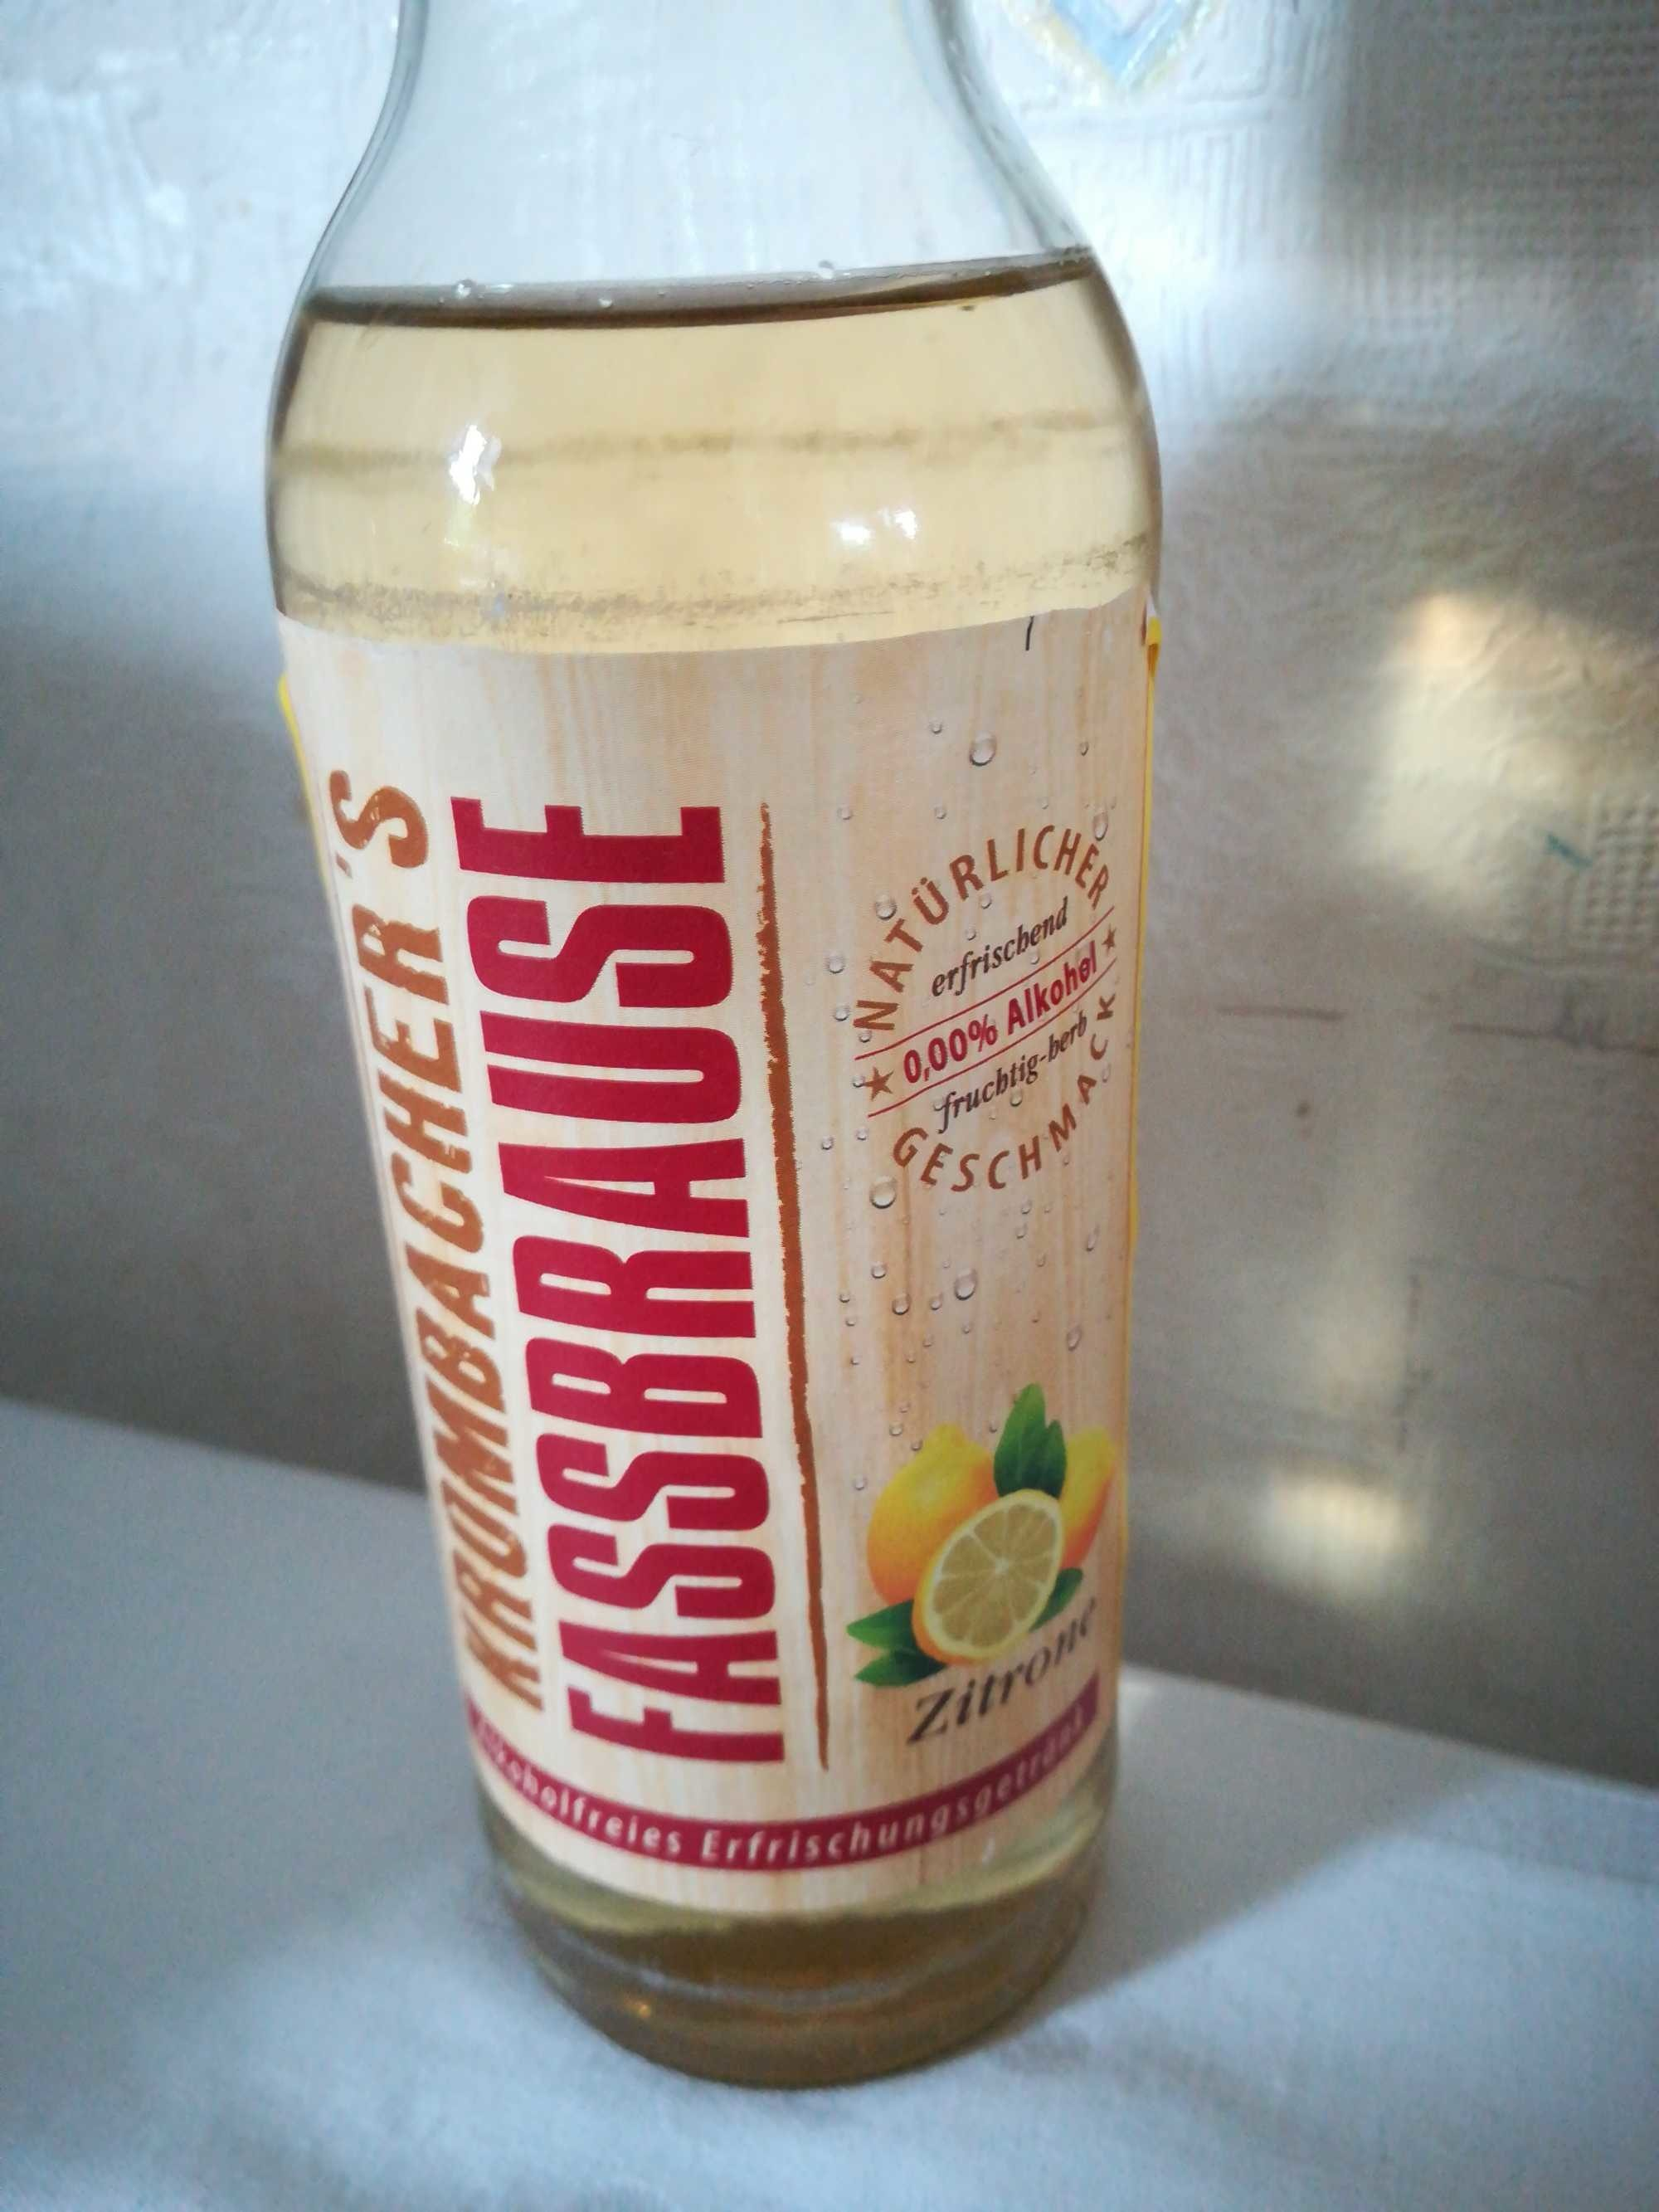 Fassbrause Zitrone - Product - de